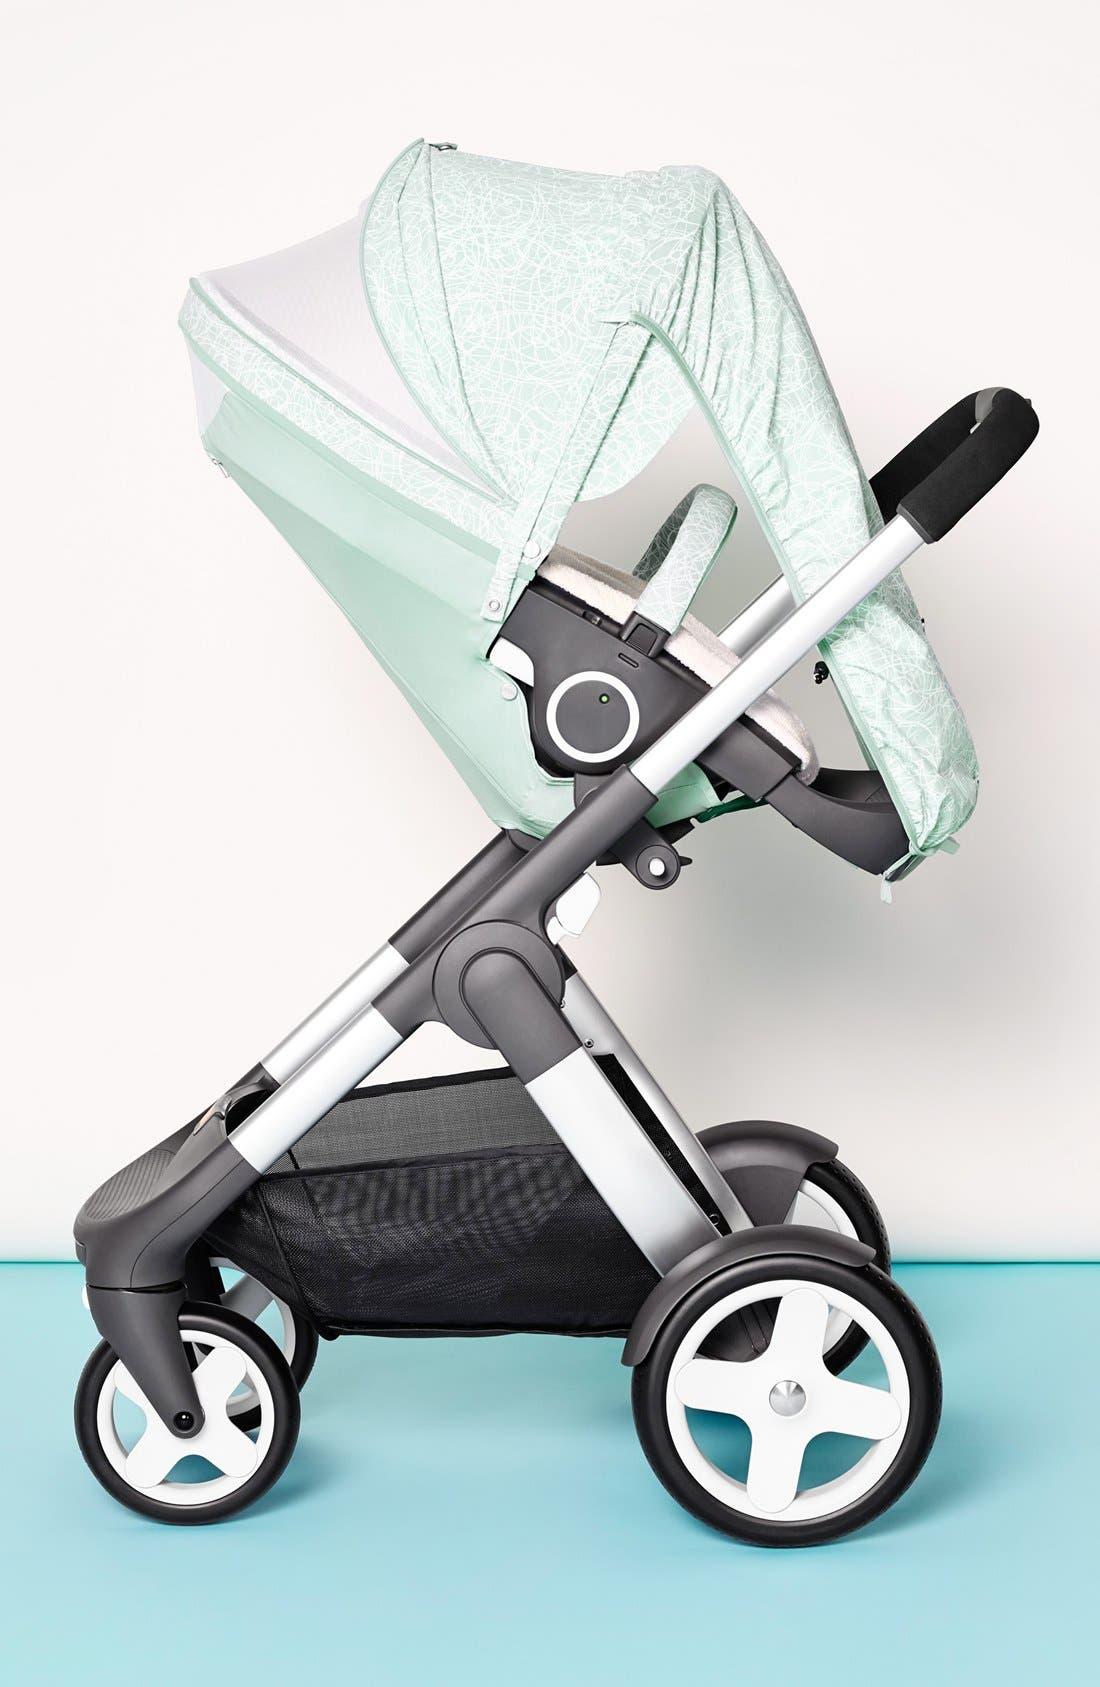 Baby 'Xplory<sup>®</sup> Stroller Summer Kit' Shade Set,                             Alternate thumbnail 5, color,                             Salty Blue